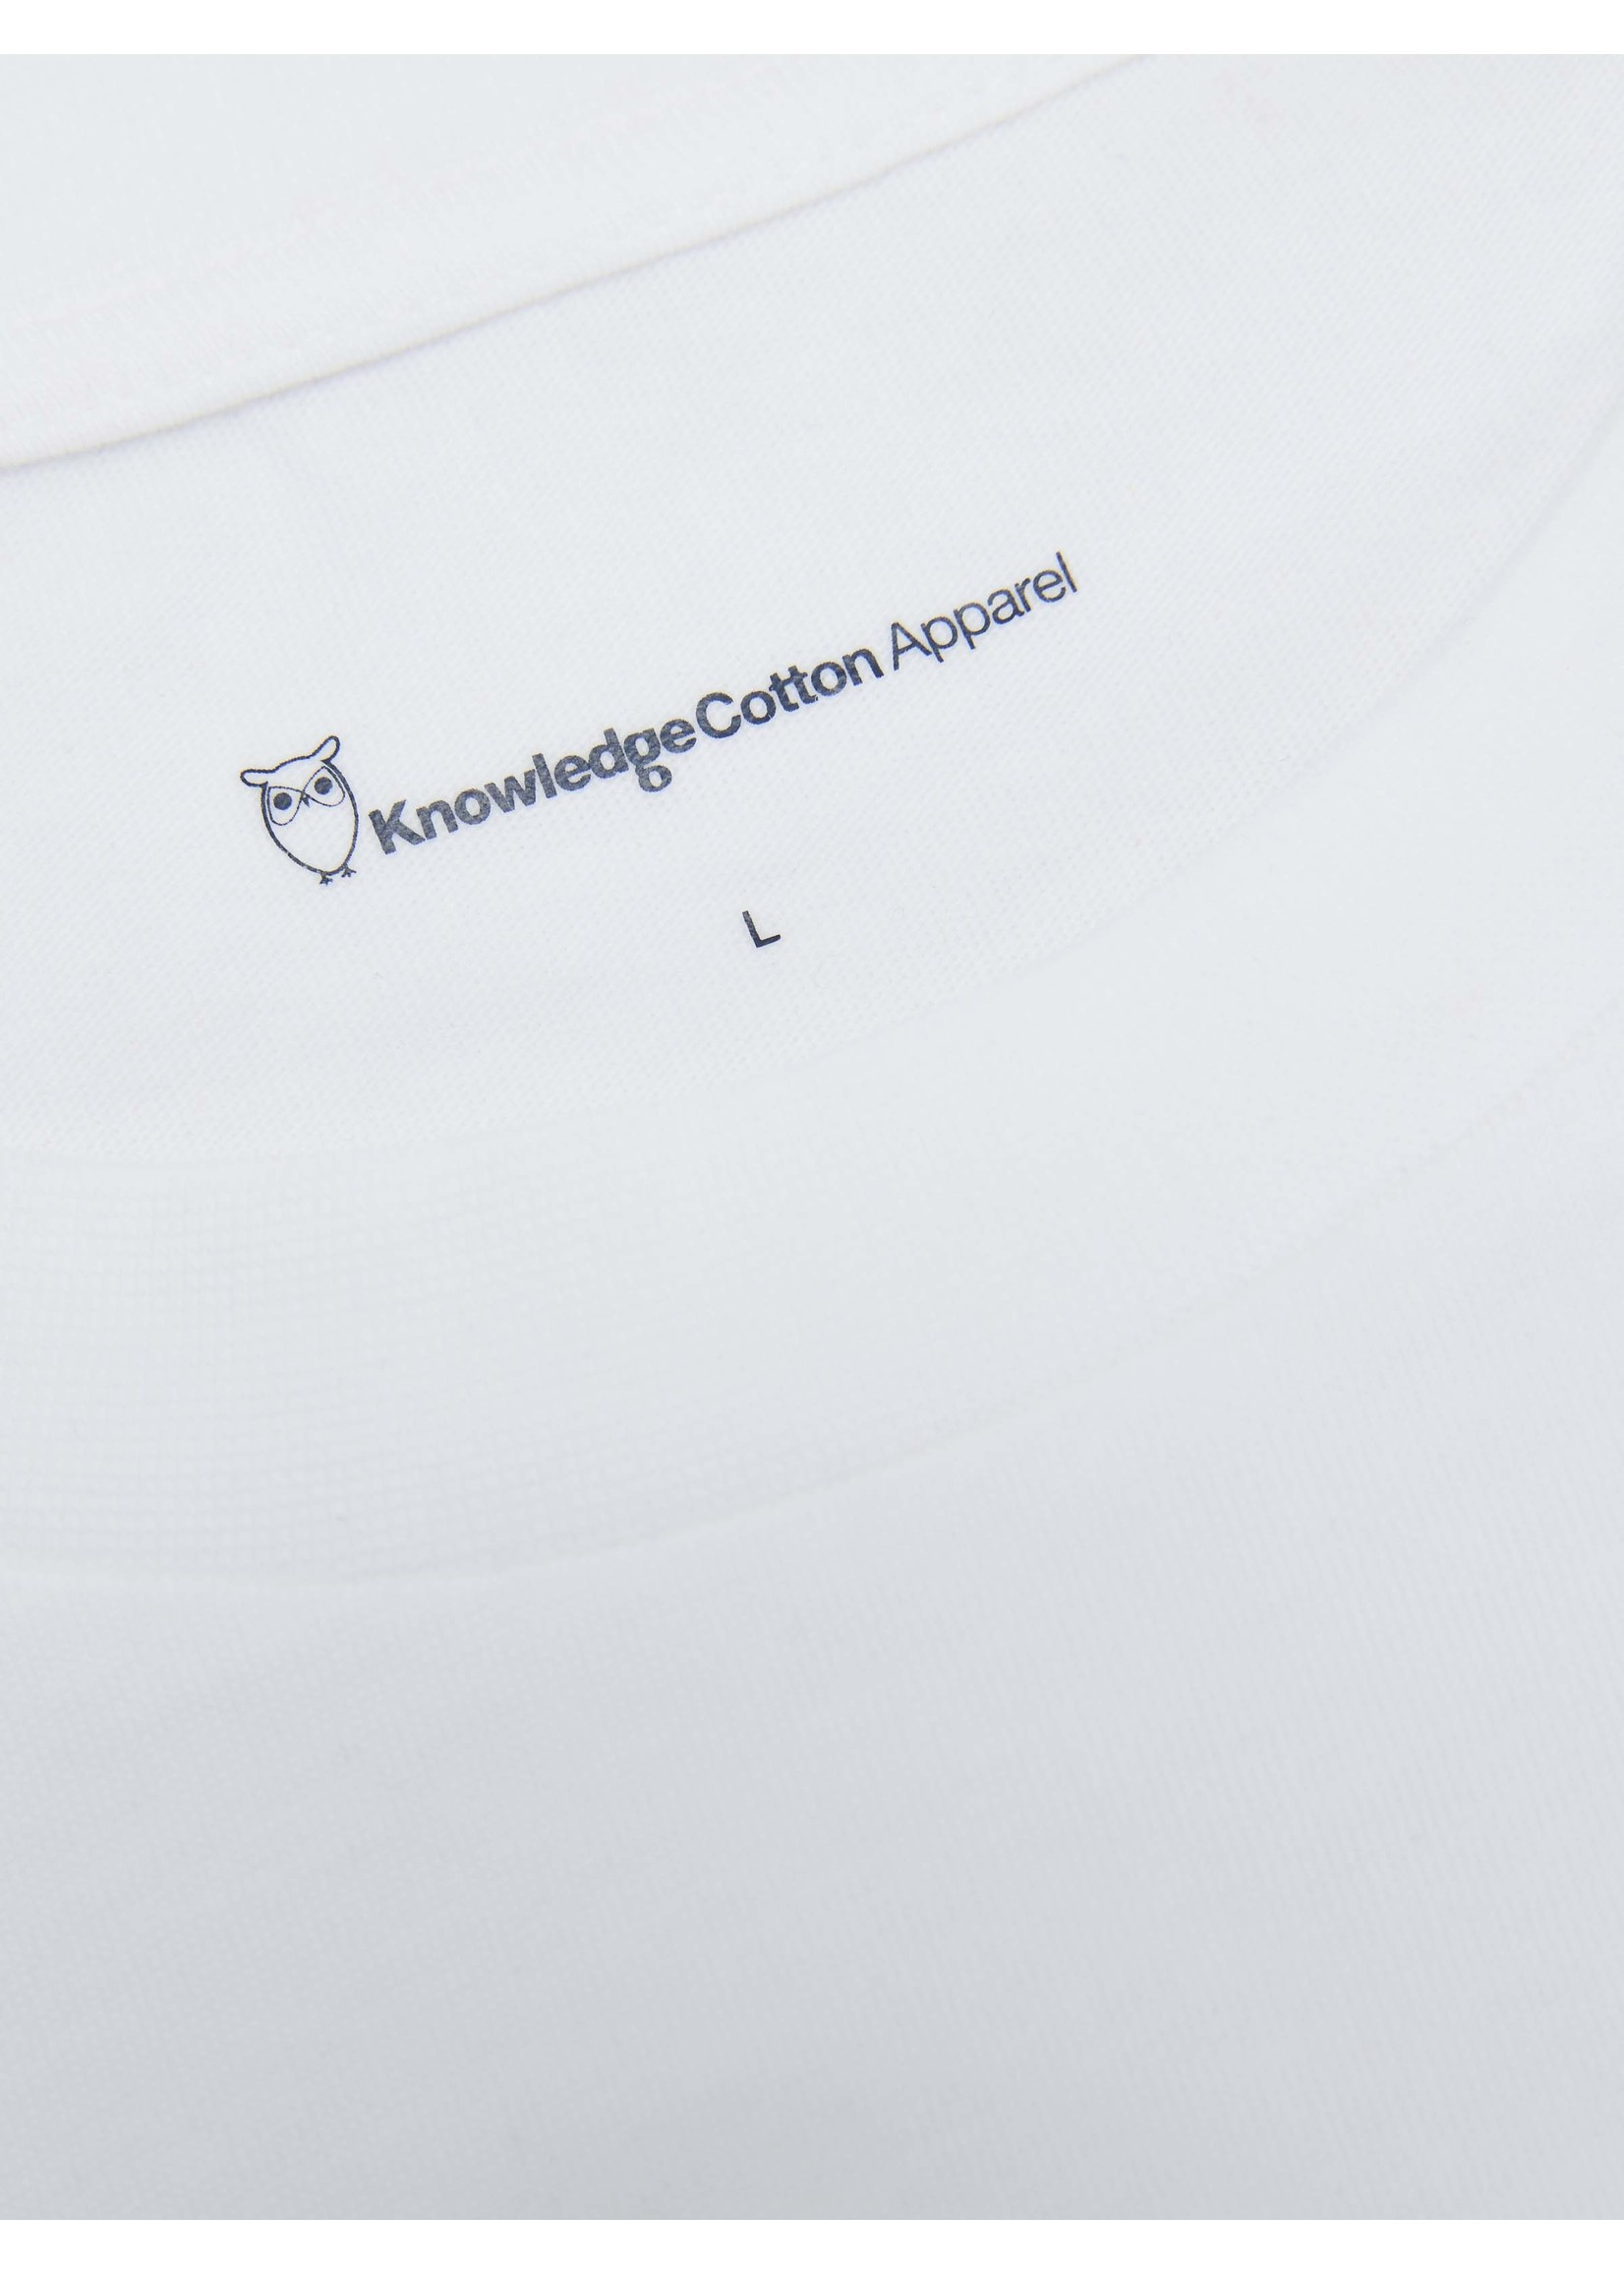 KnowledgeCotton KnowledgeCotton ALDER landscape printed on white tee